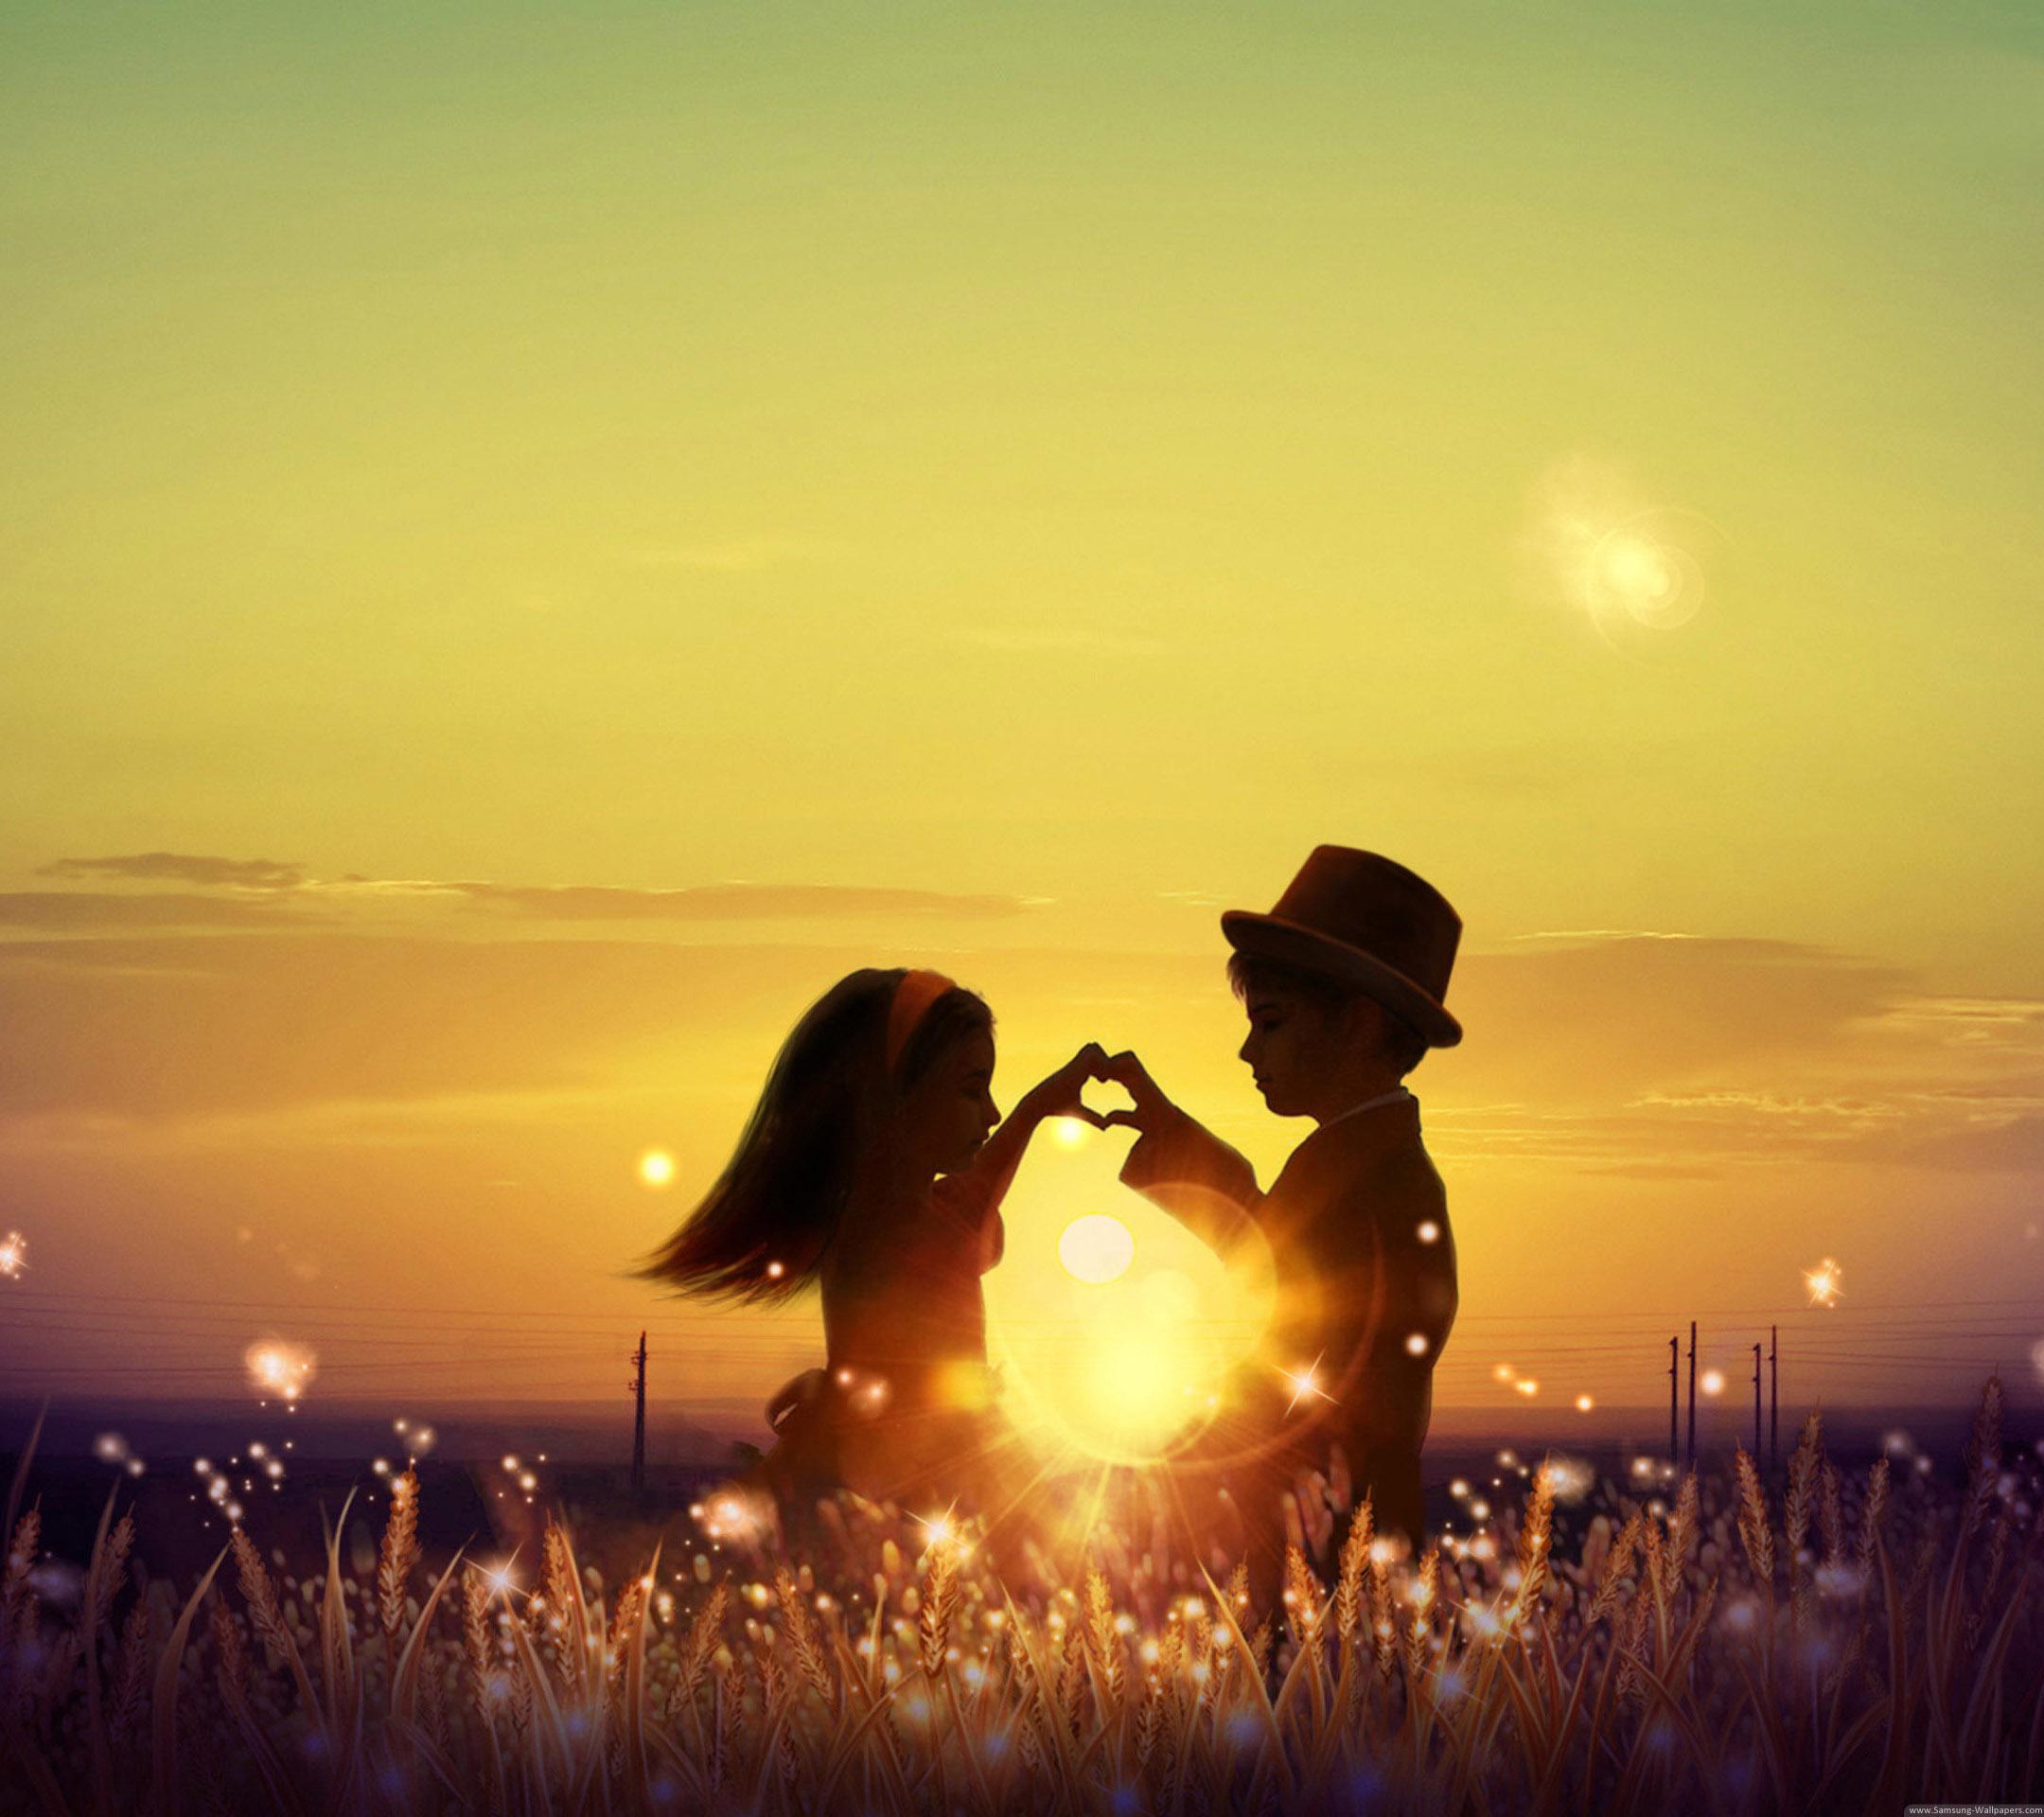 Child Love Lock Screen Hd Samsung Galaxy Note 3 Wallpaper 2160x1920 Download Hd Wallpaper Wallpapertip